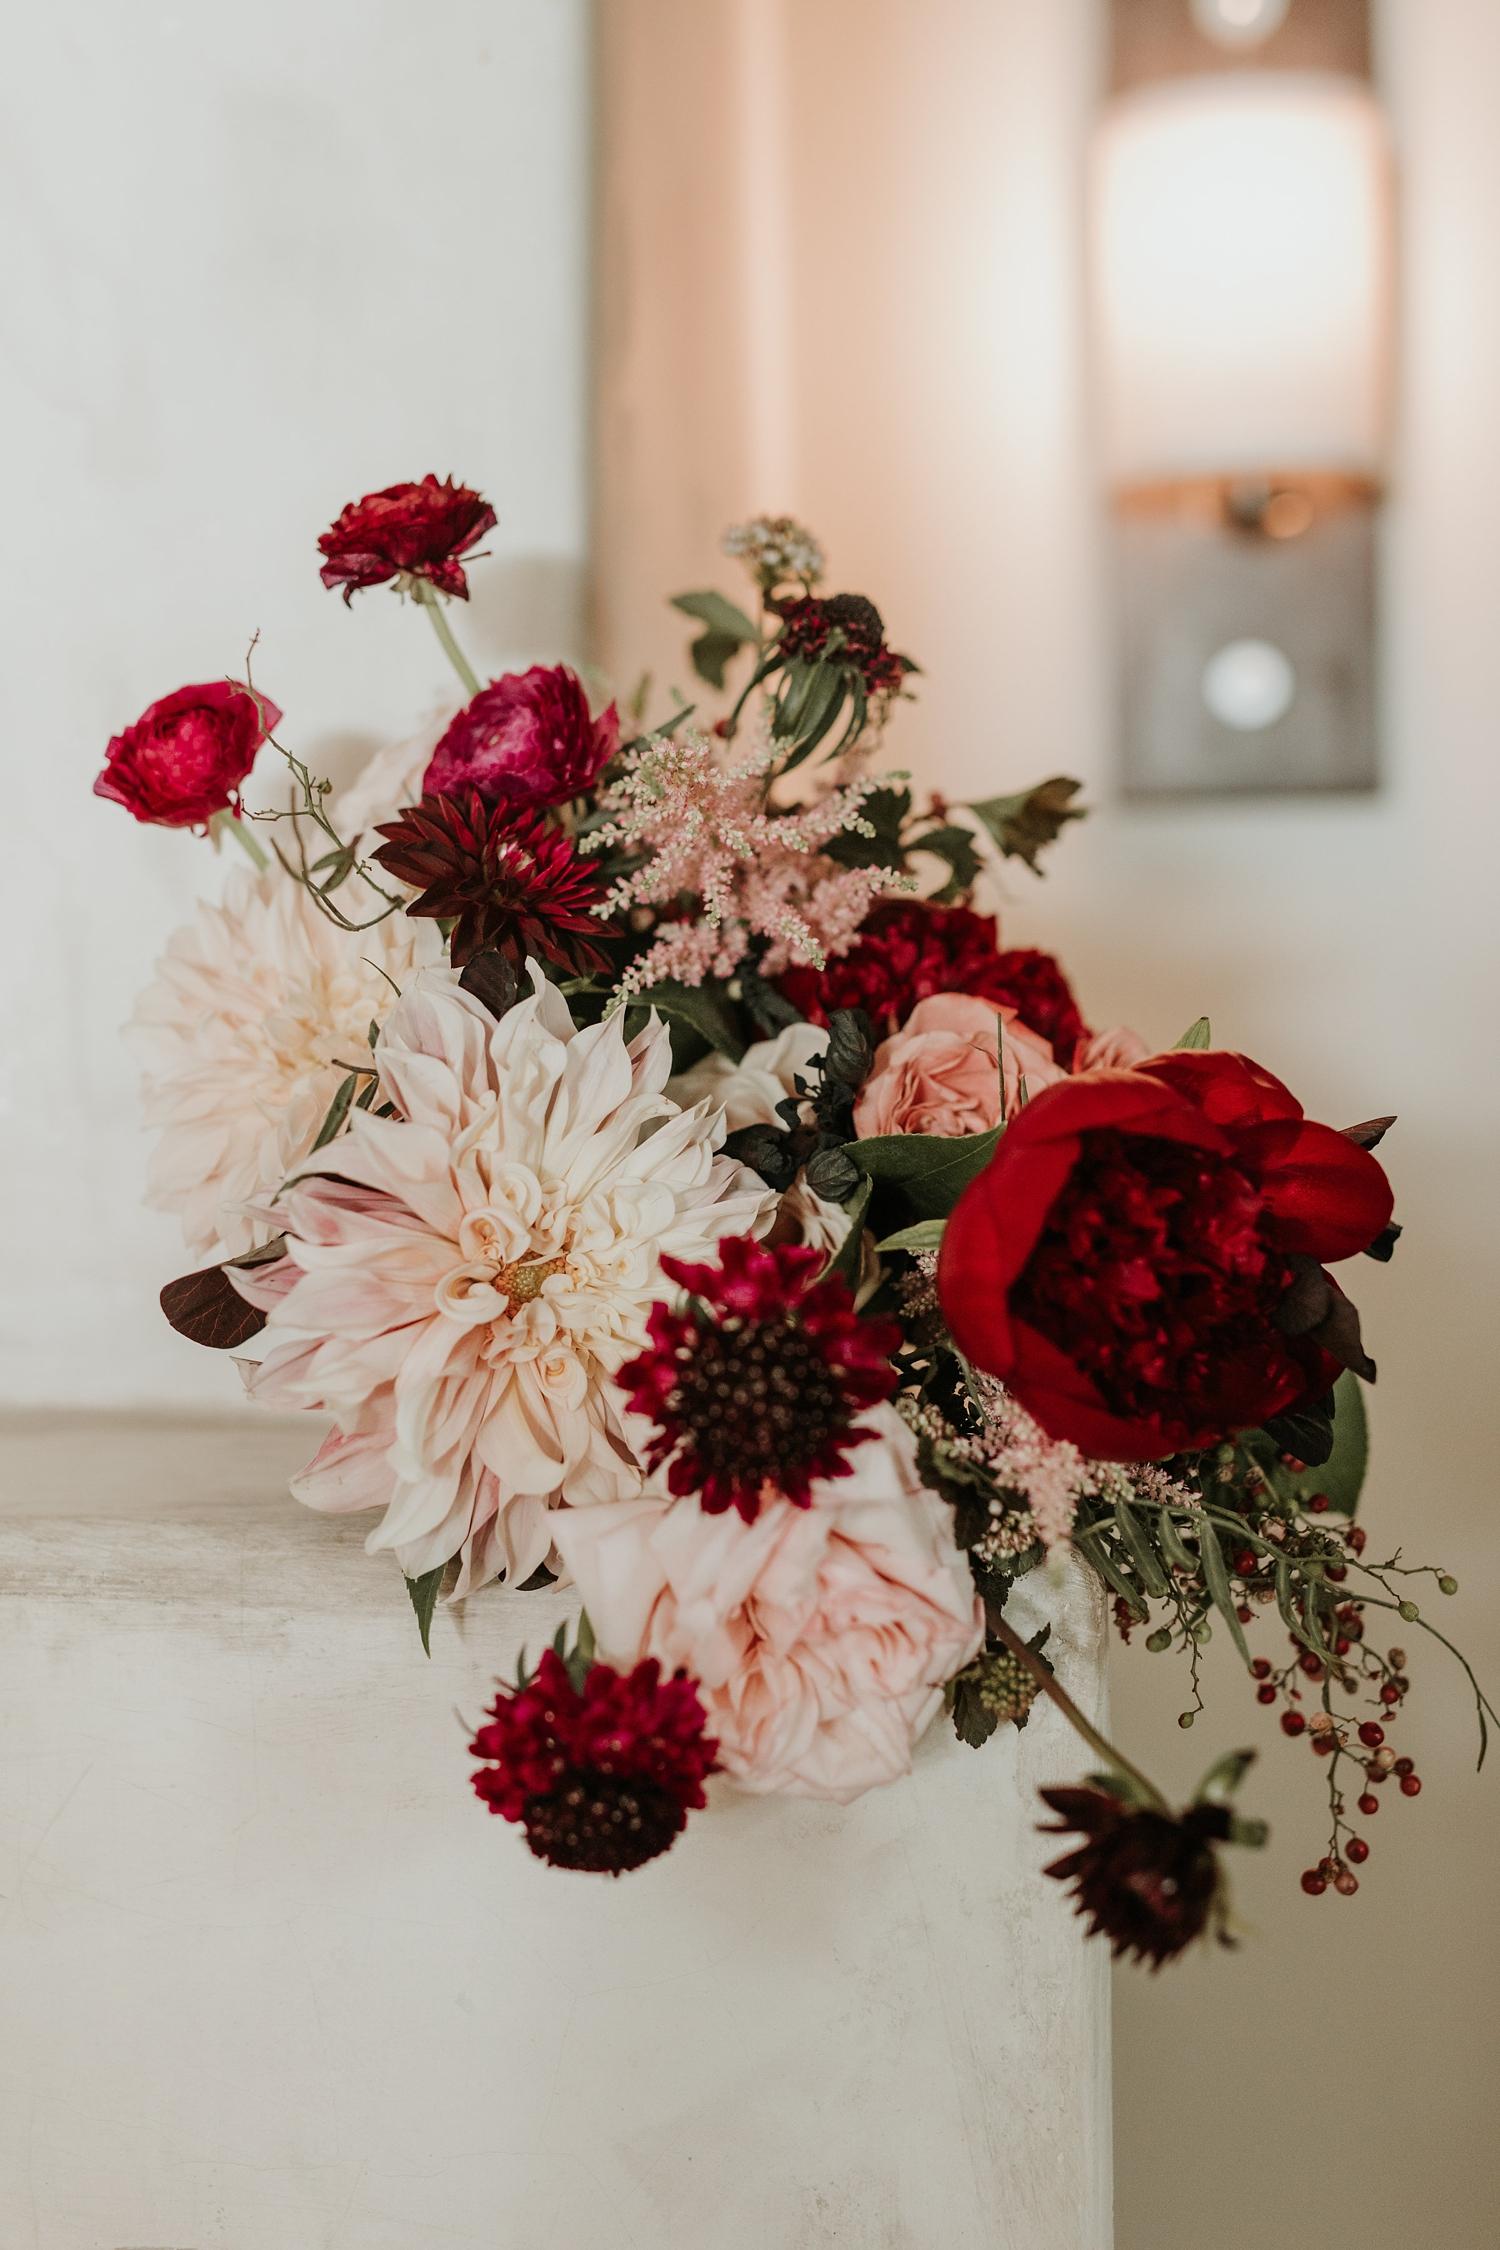 Alicia+lucia+photography+-+albuquerque+wedding+photographer+-+santa+fe+wedding+photography+-+new+mexico+wedding+photographer+-+wedding+flowers+-+summer+wedding+flowers_0036.jpg